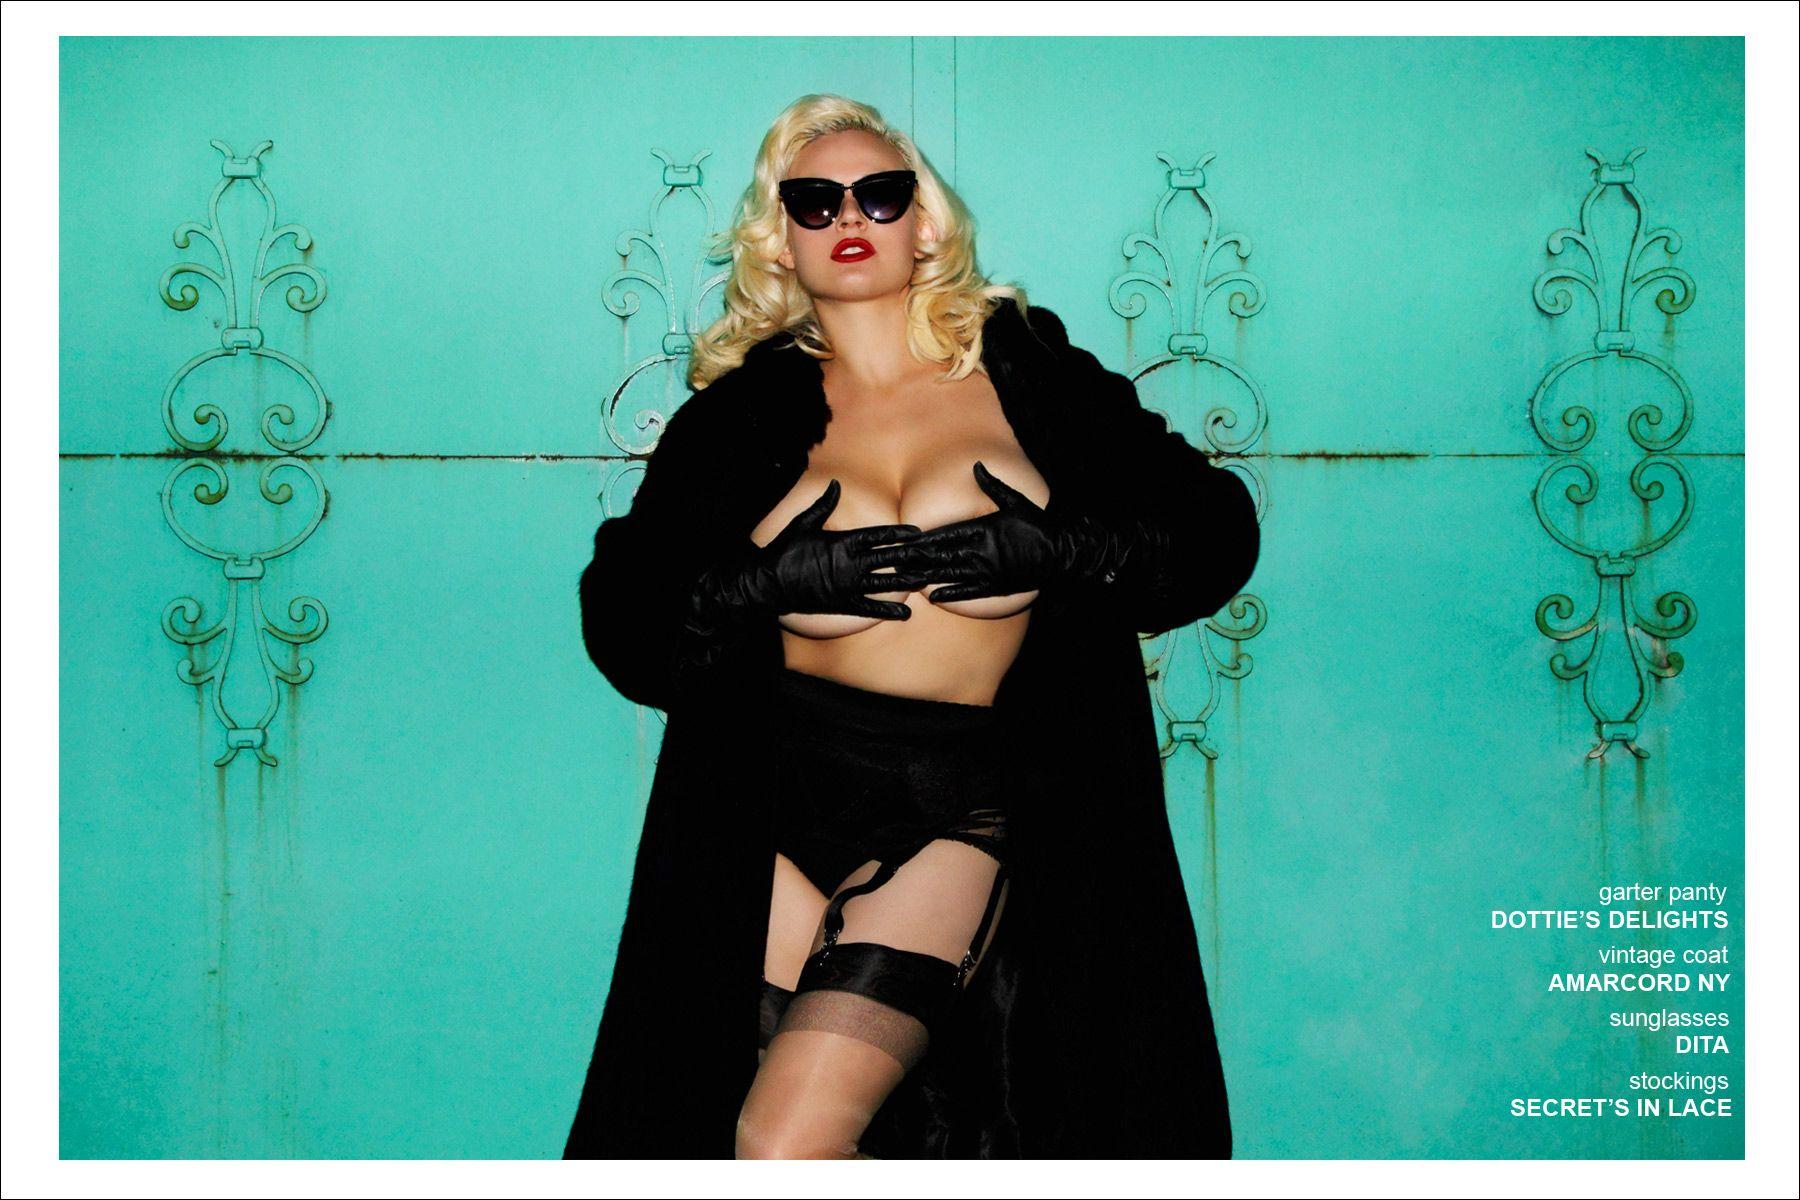 2019 Gia Genevieve nude photos 2019